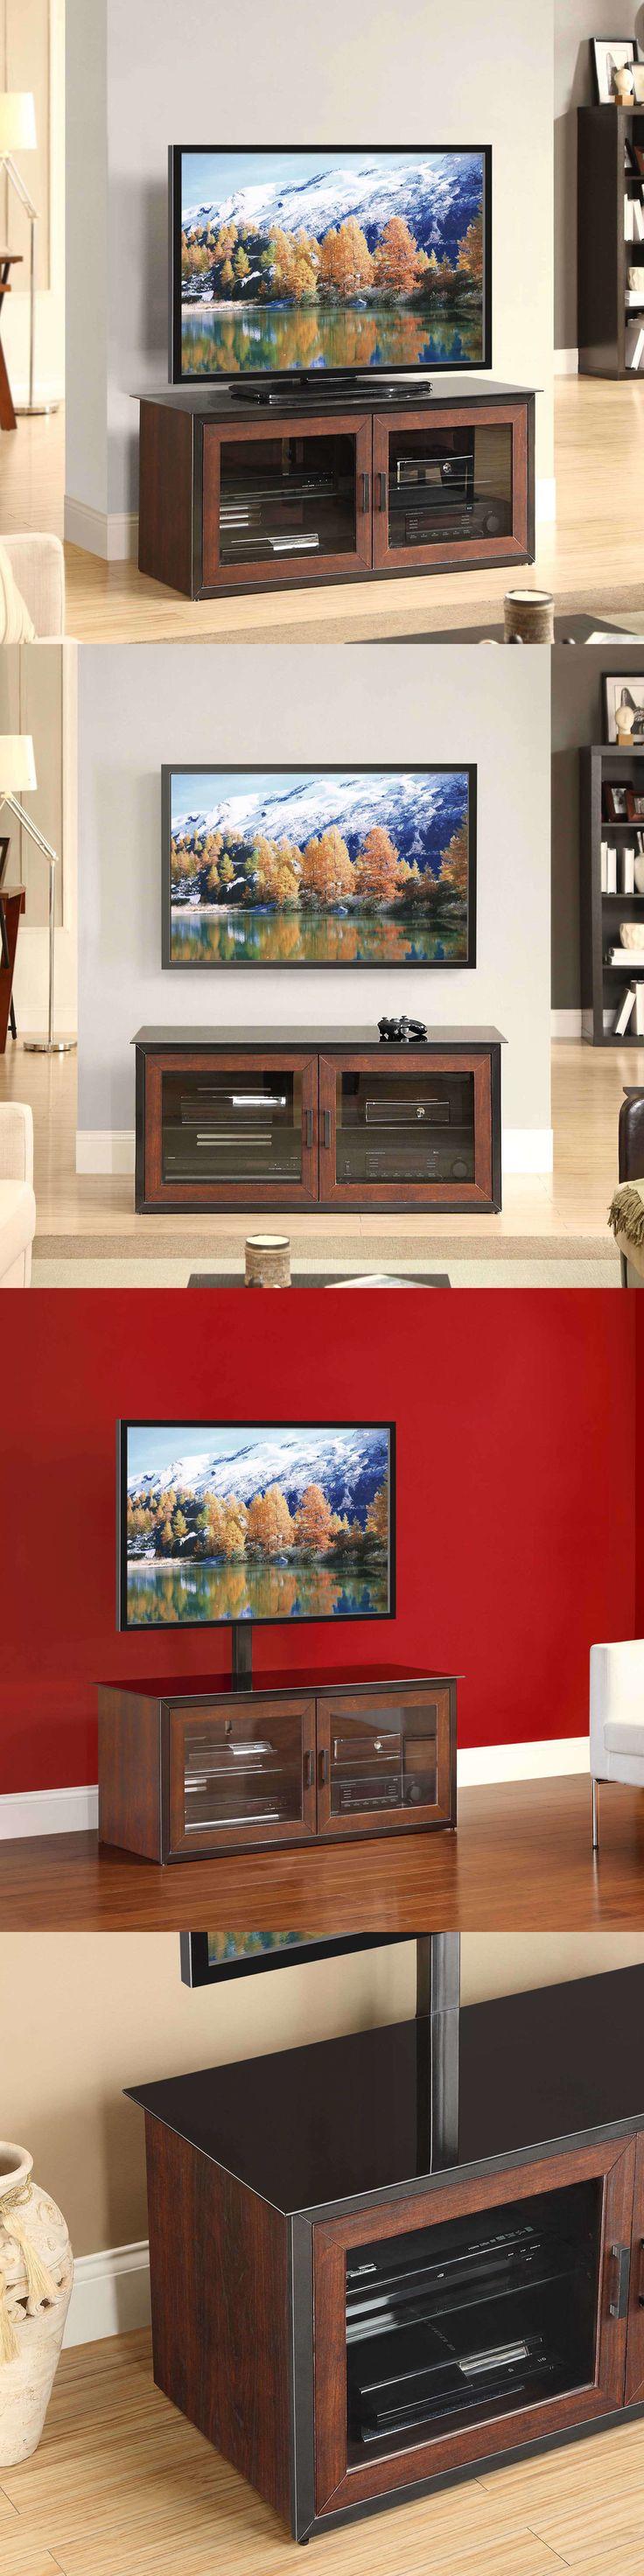 Best Tv Entertainment Units Ideas On Pinterest Tv Wall Units - Tv wall units ebay